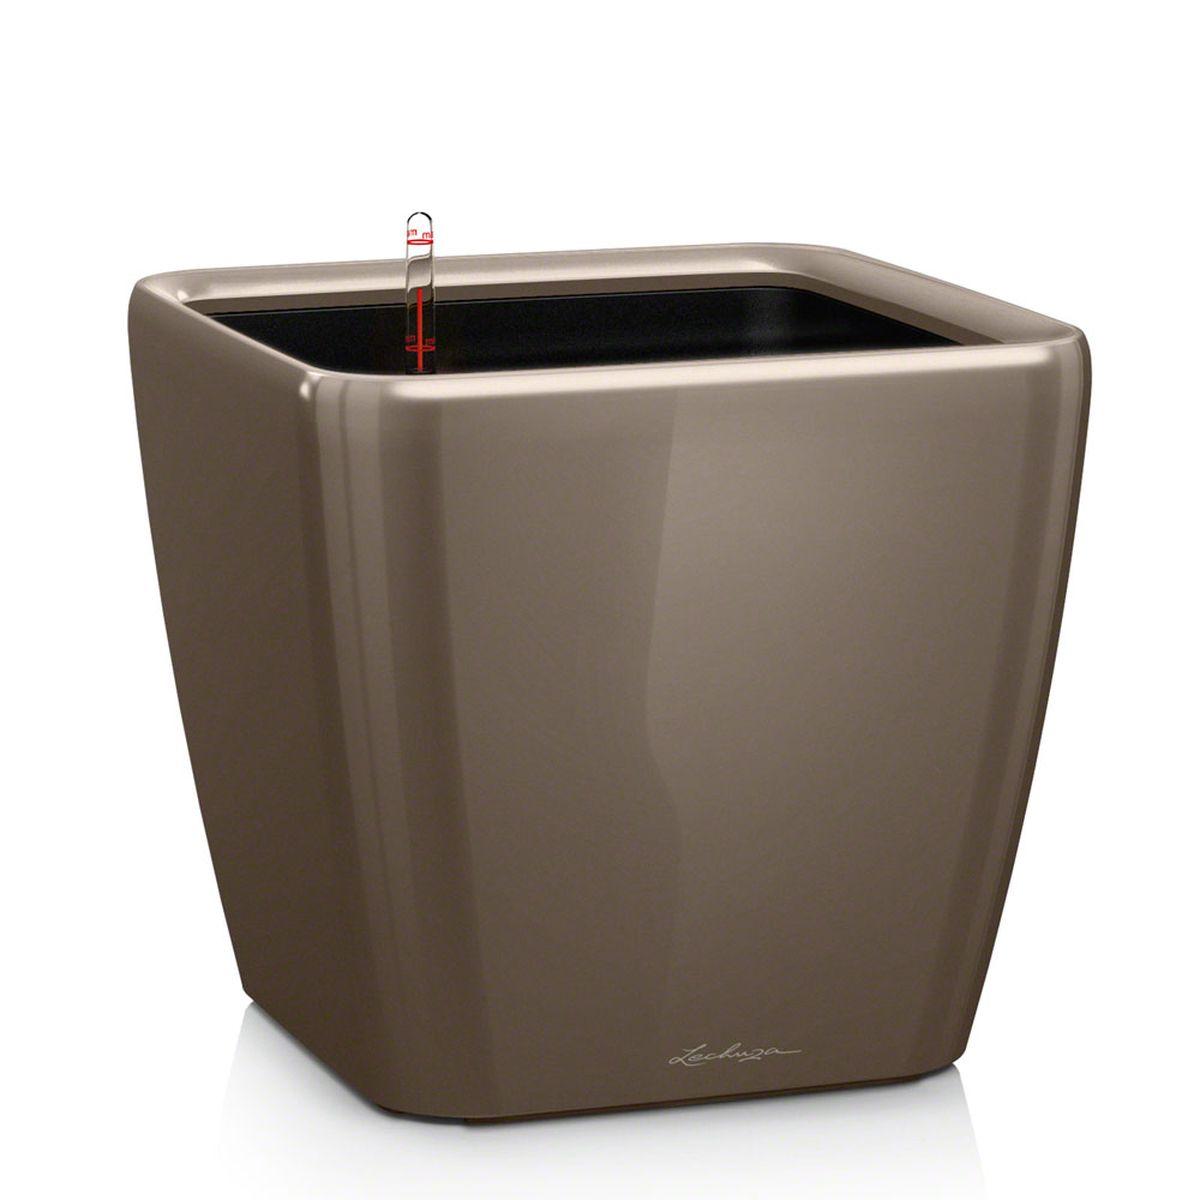 "Кашпо Lechuza ""Quadro"", с системой автополива, цвет: серо-коричневый, 33 х 33 х 35 см"